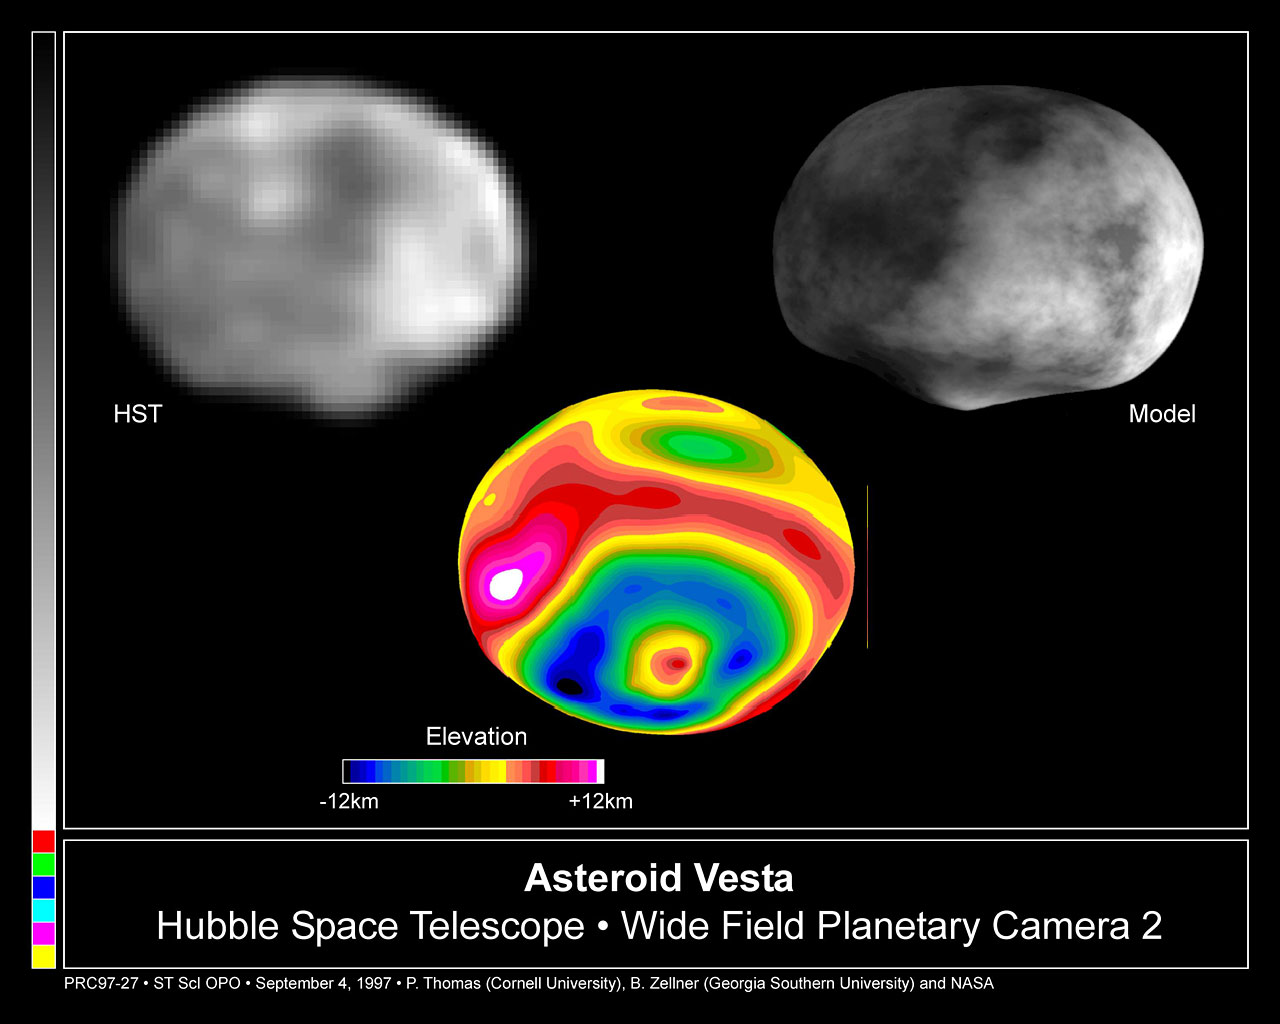 Crater on Asteroid Vesta